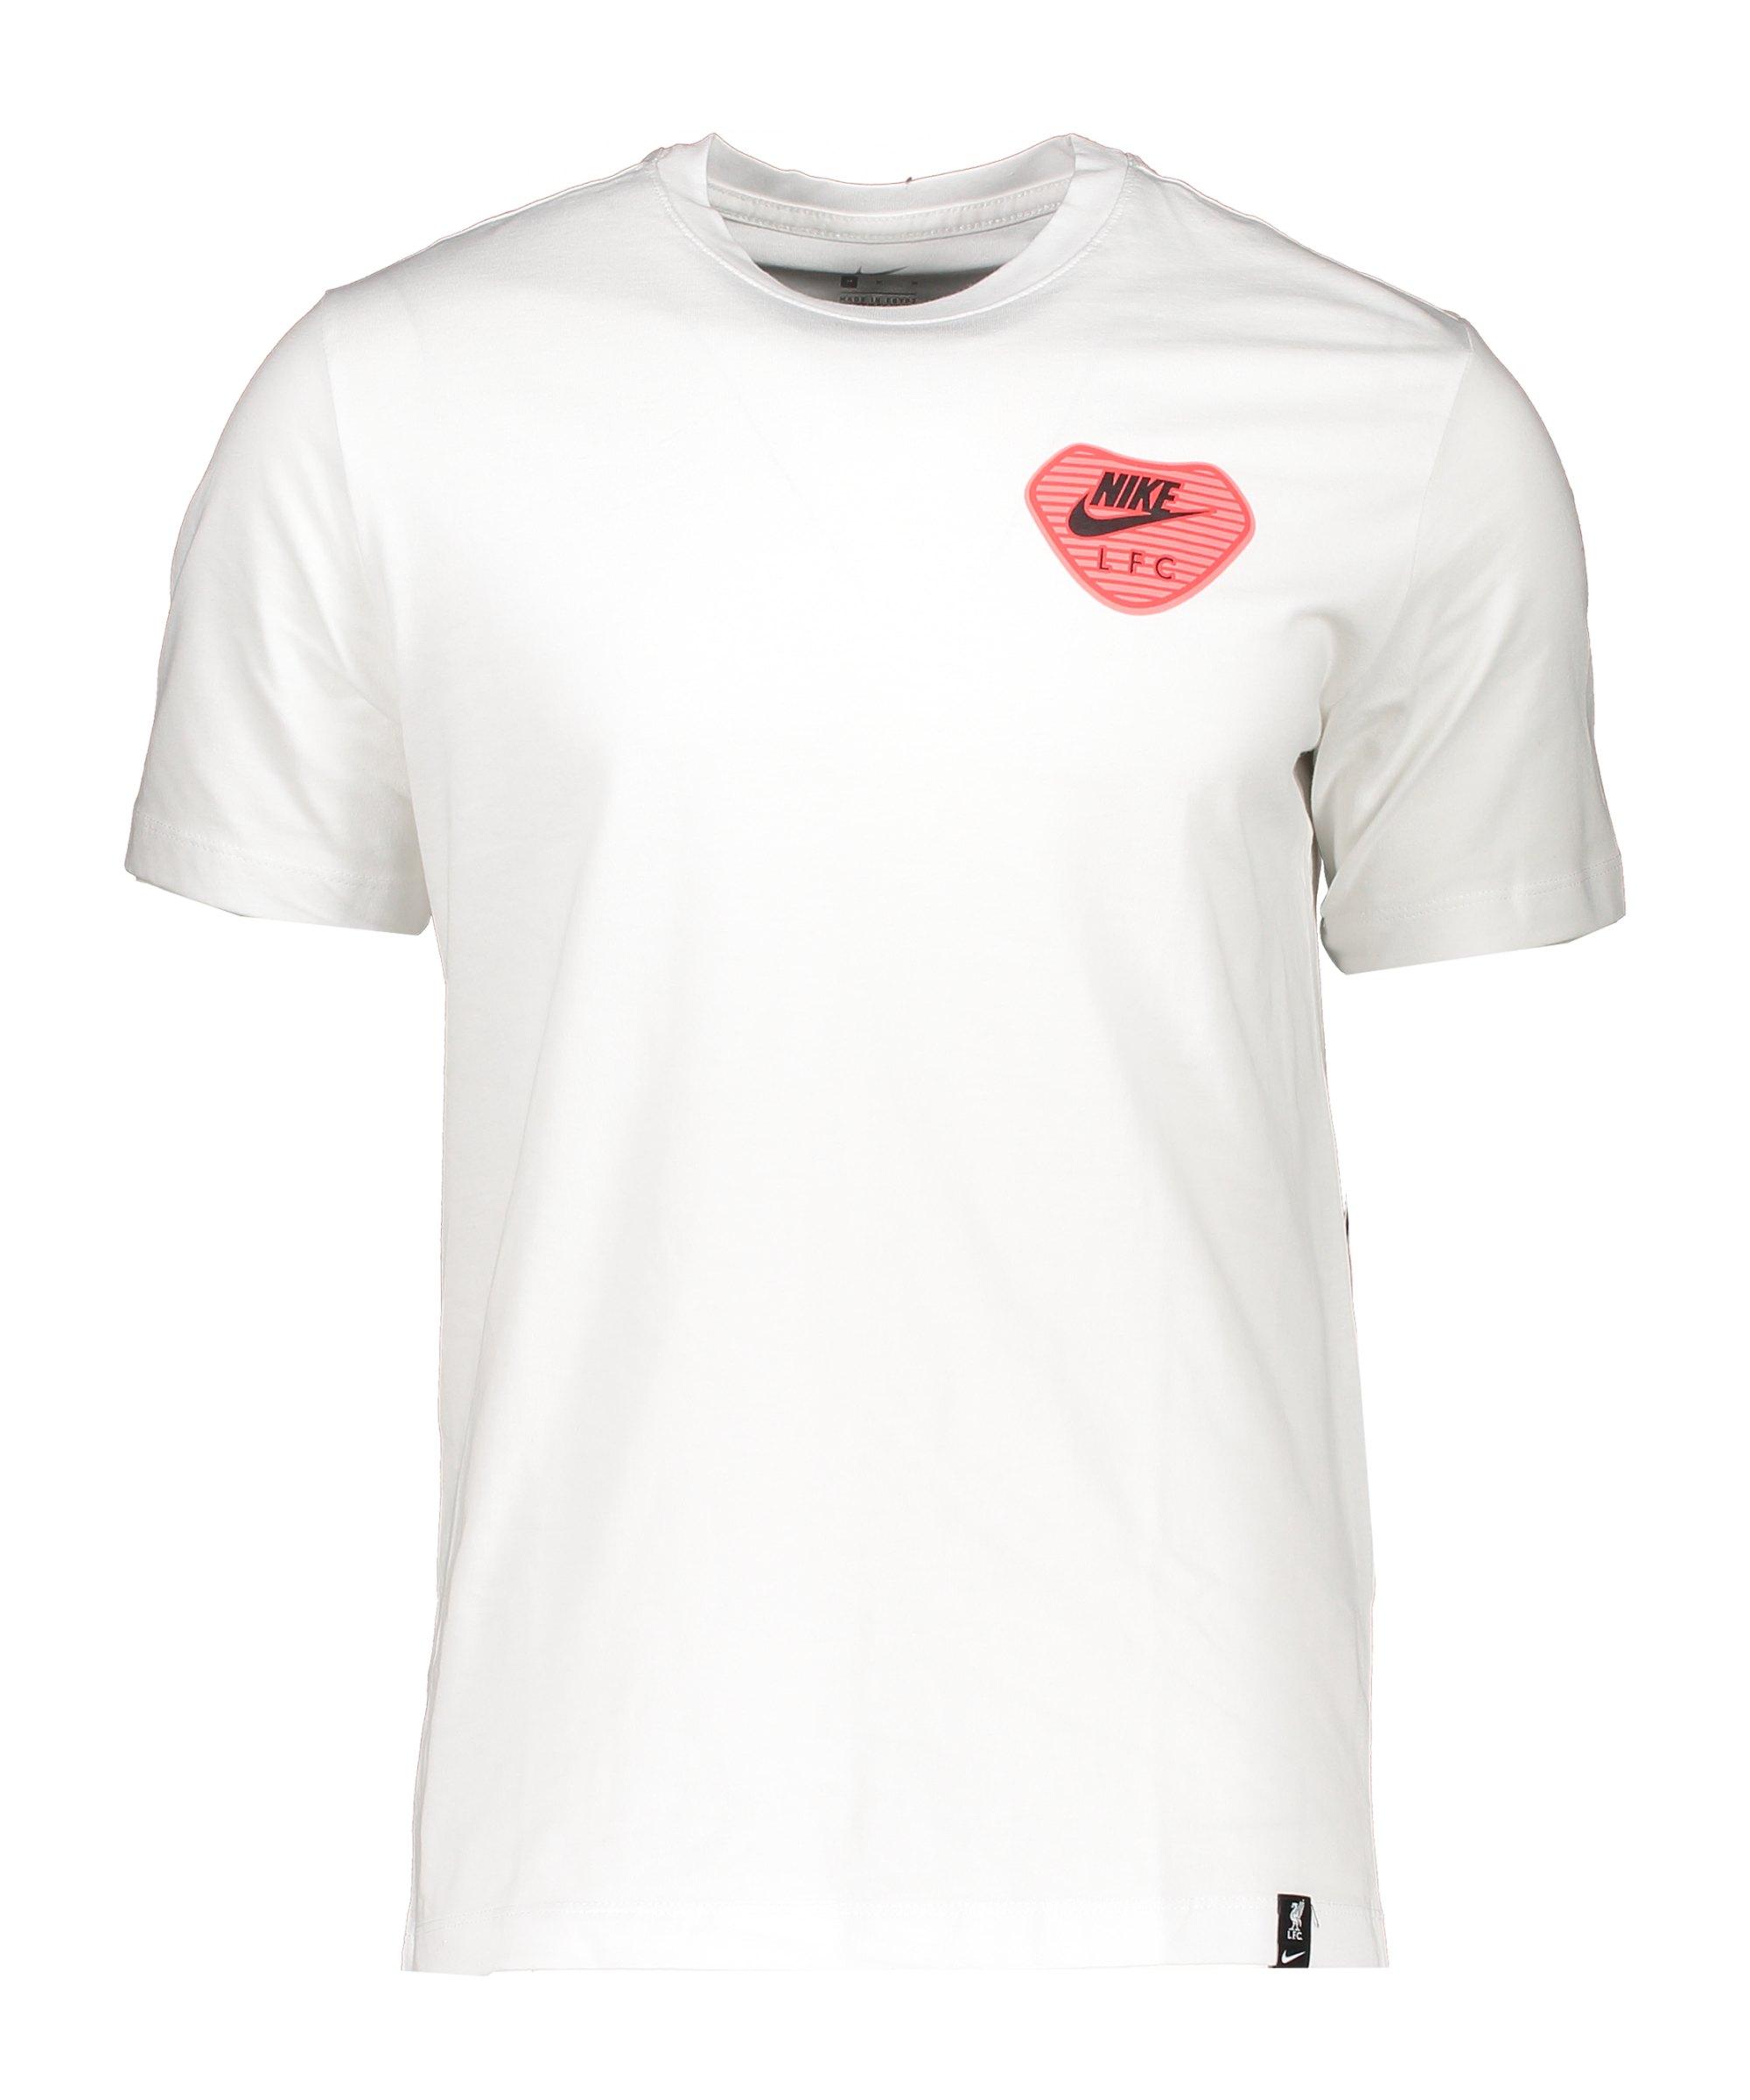 Nike FC Liverpool Travel T-Shirt Weiss F100 - weiss